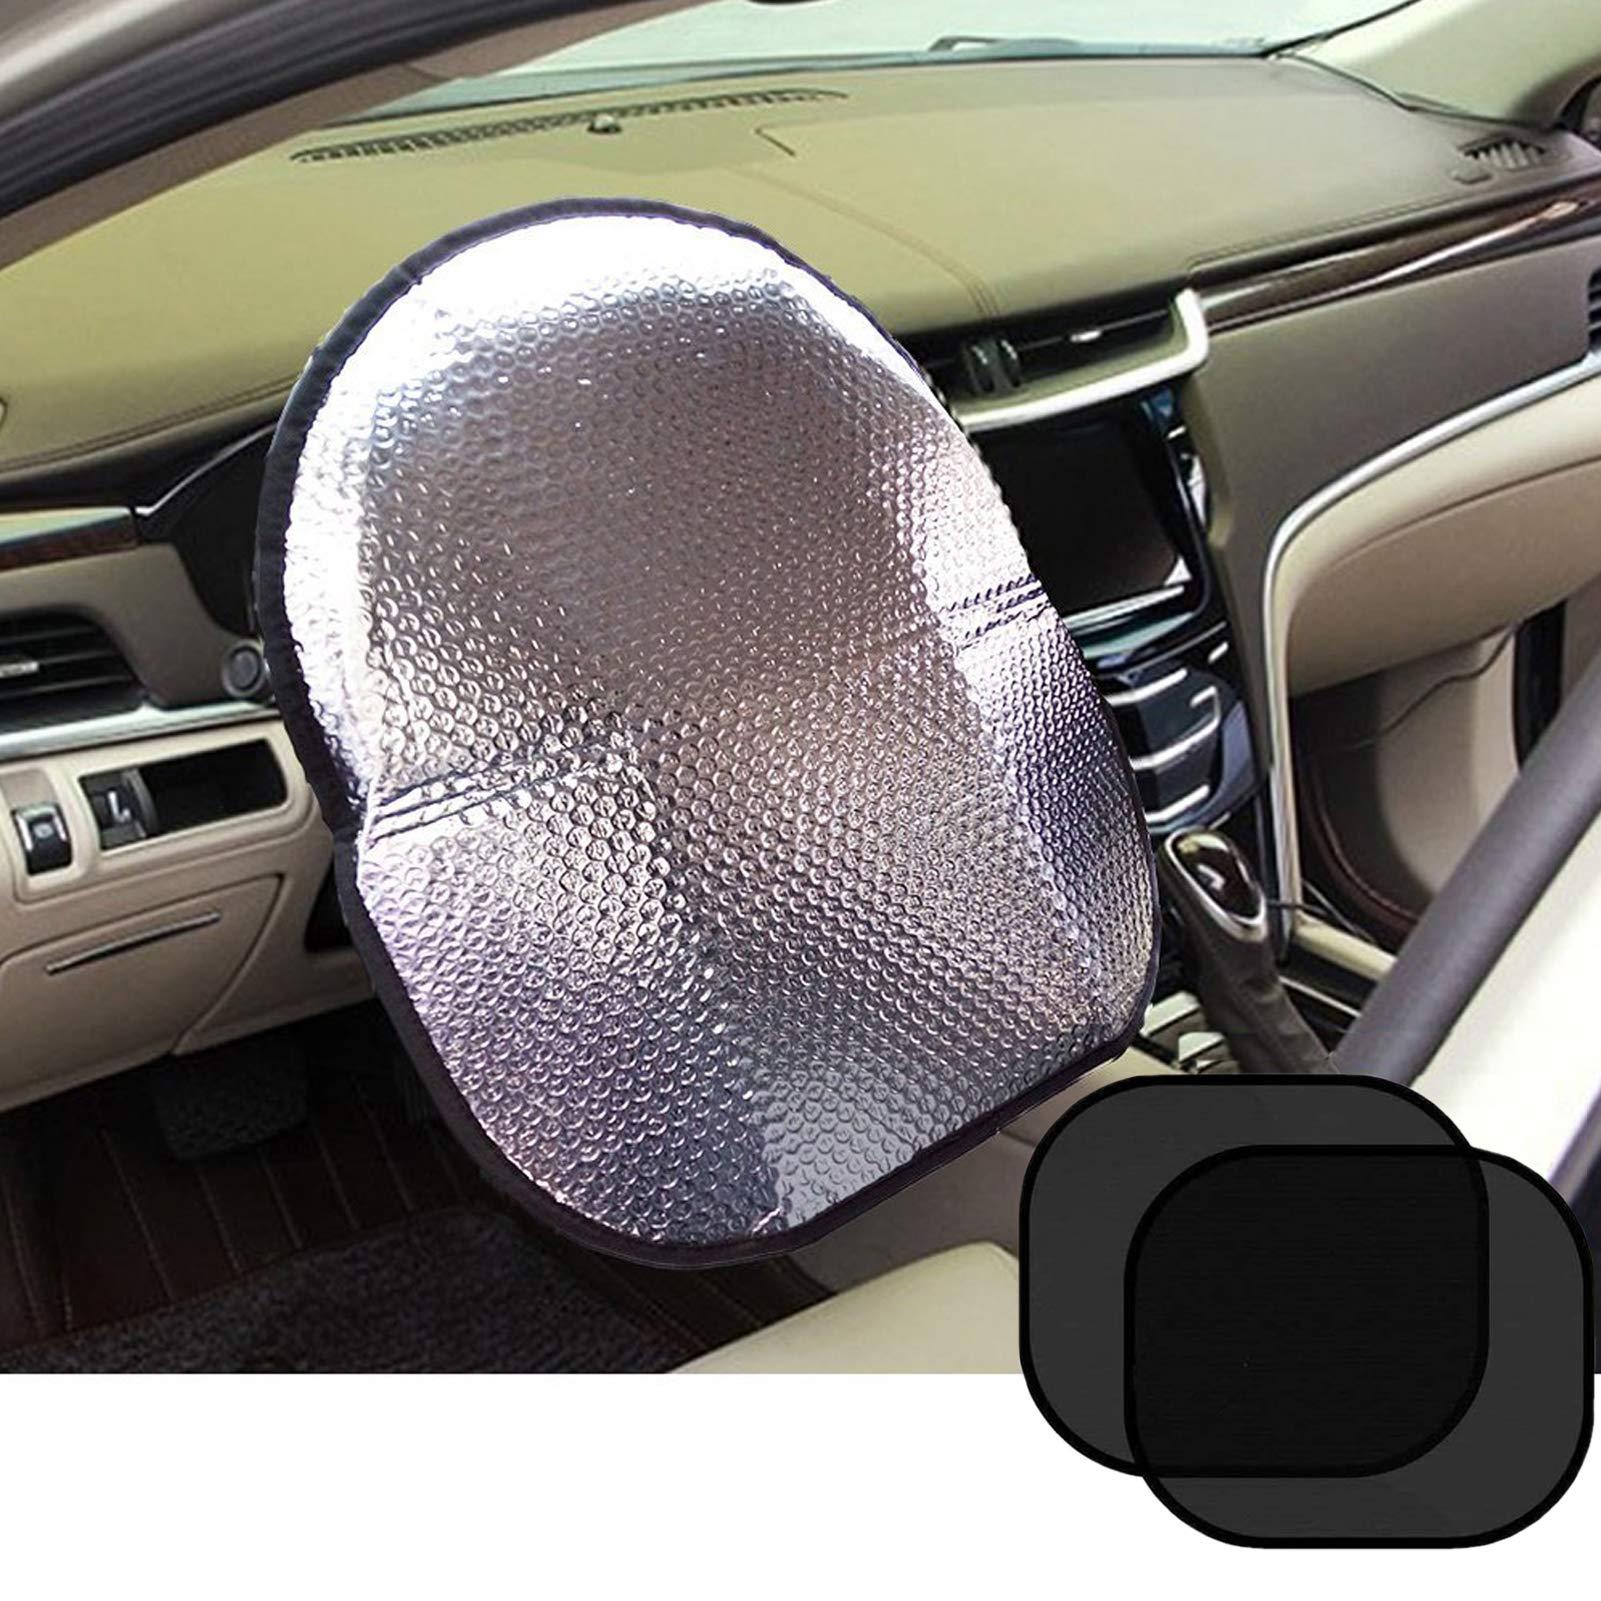 "Big Ant Steering Wheel Cover Sun Shade + Bonus Side Window Sunshade-Heat Reflector Fit Most Jumbo/Standard Car-Sliver (20.1""X 17.3"")"